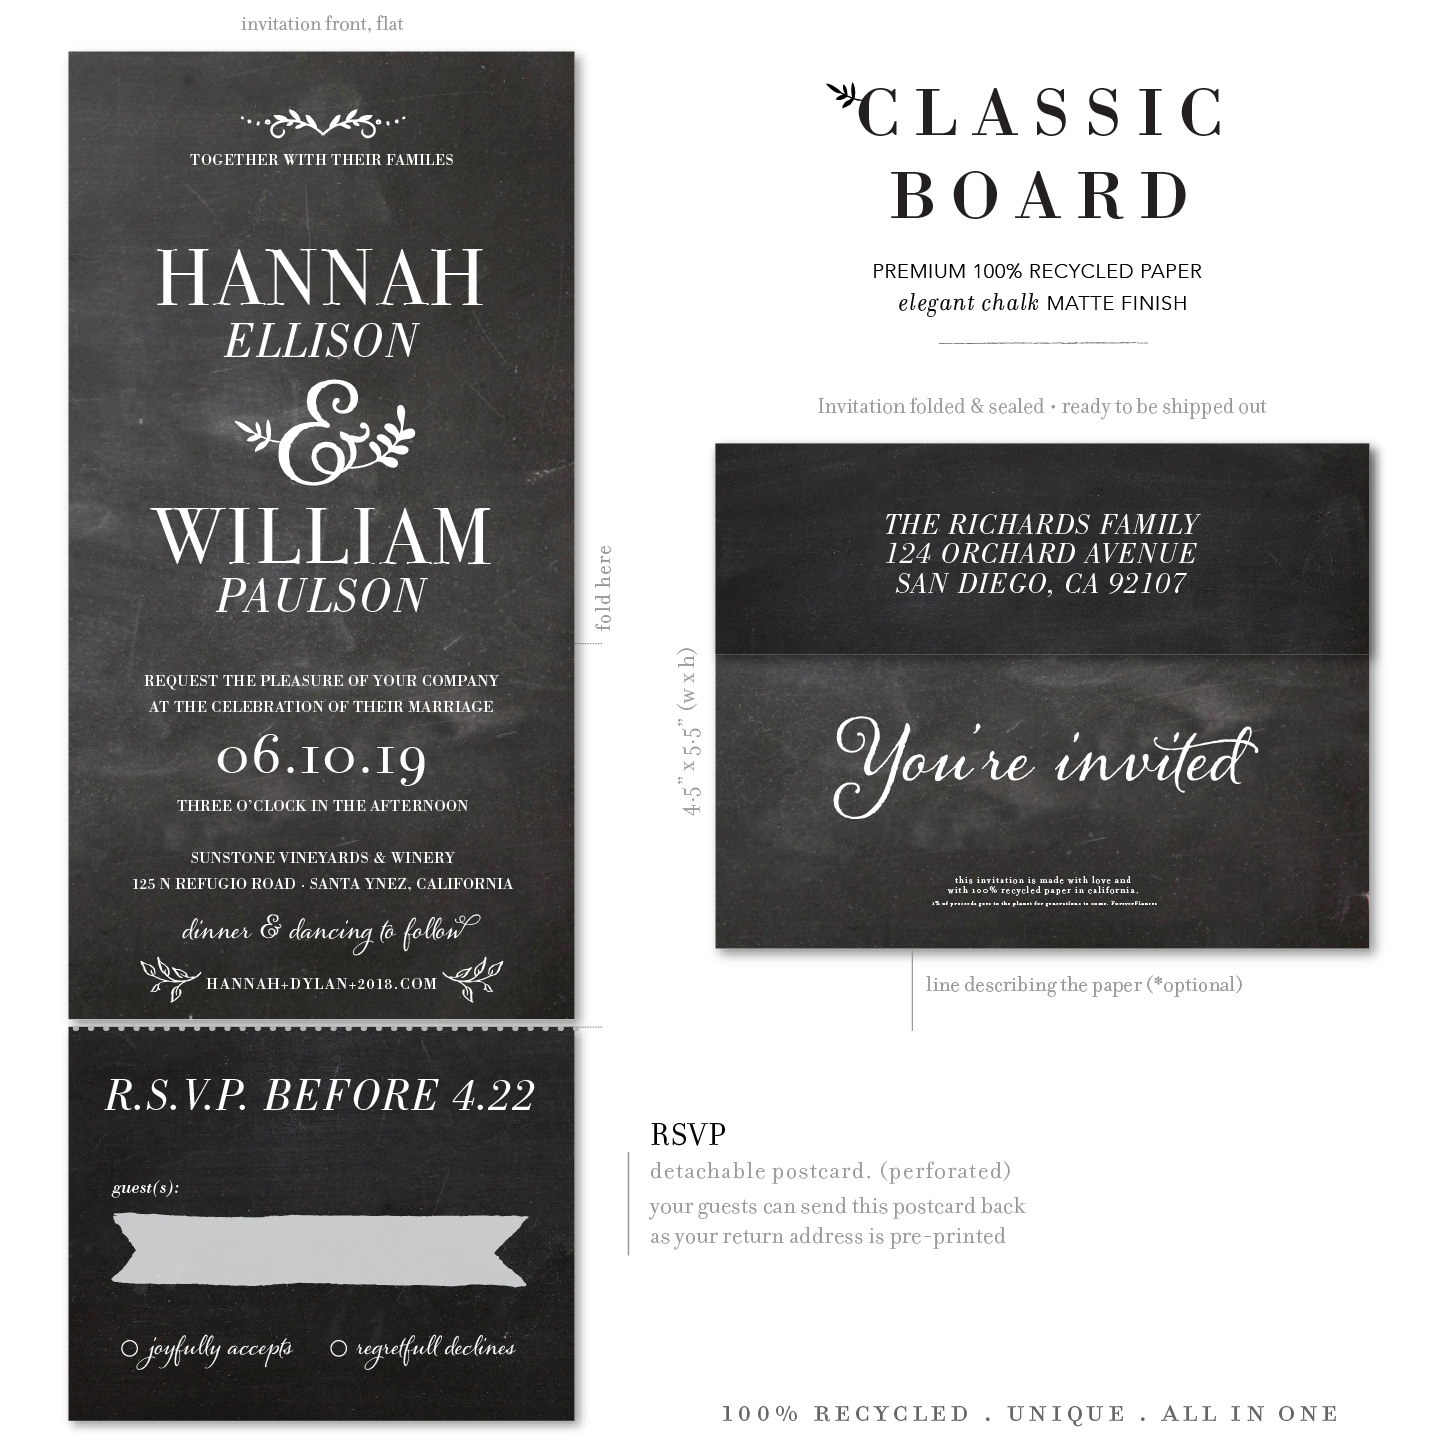 Classic Board chalk send and sealed invitations